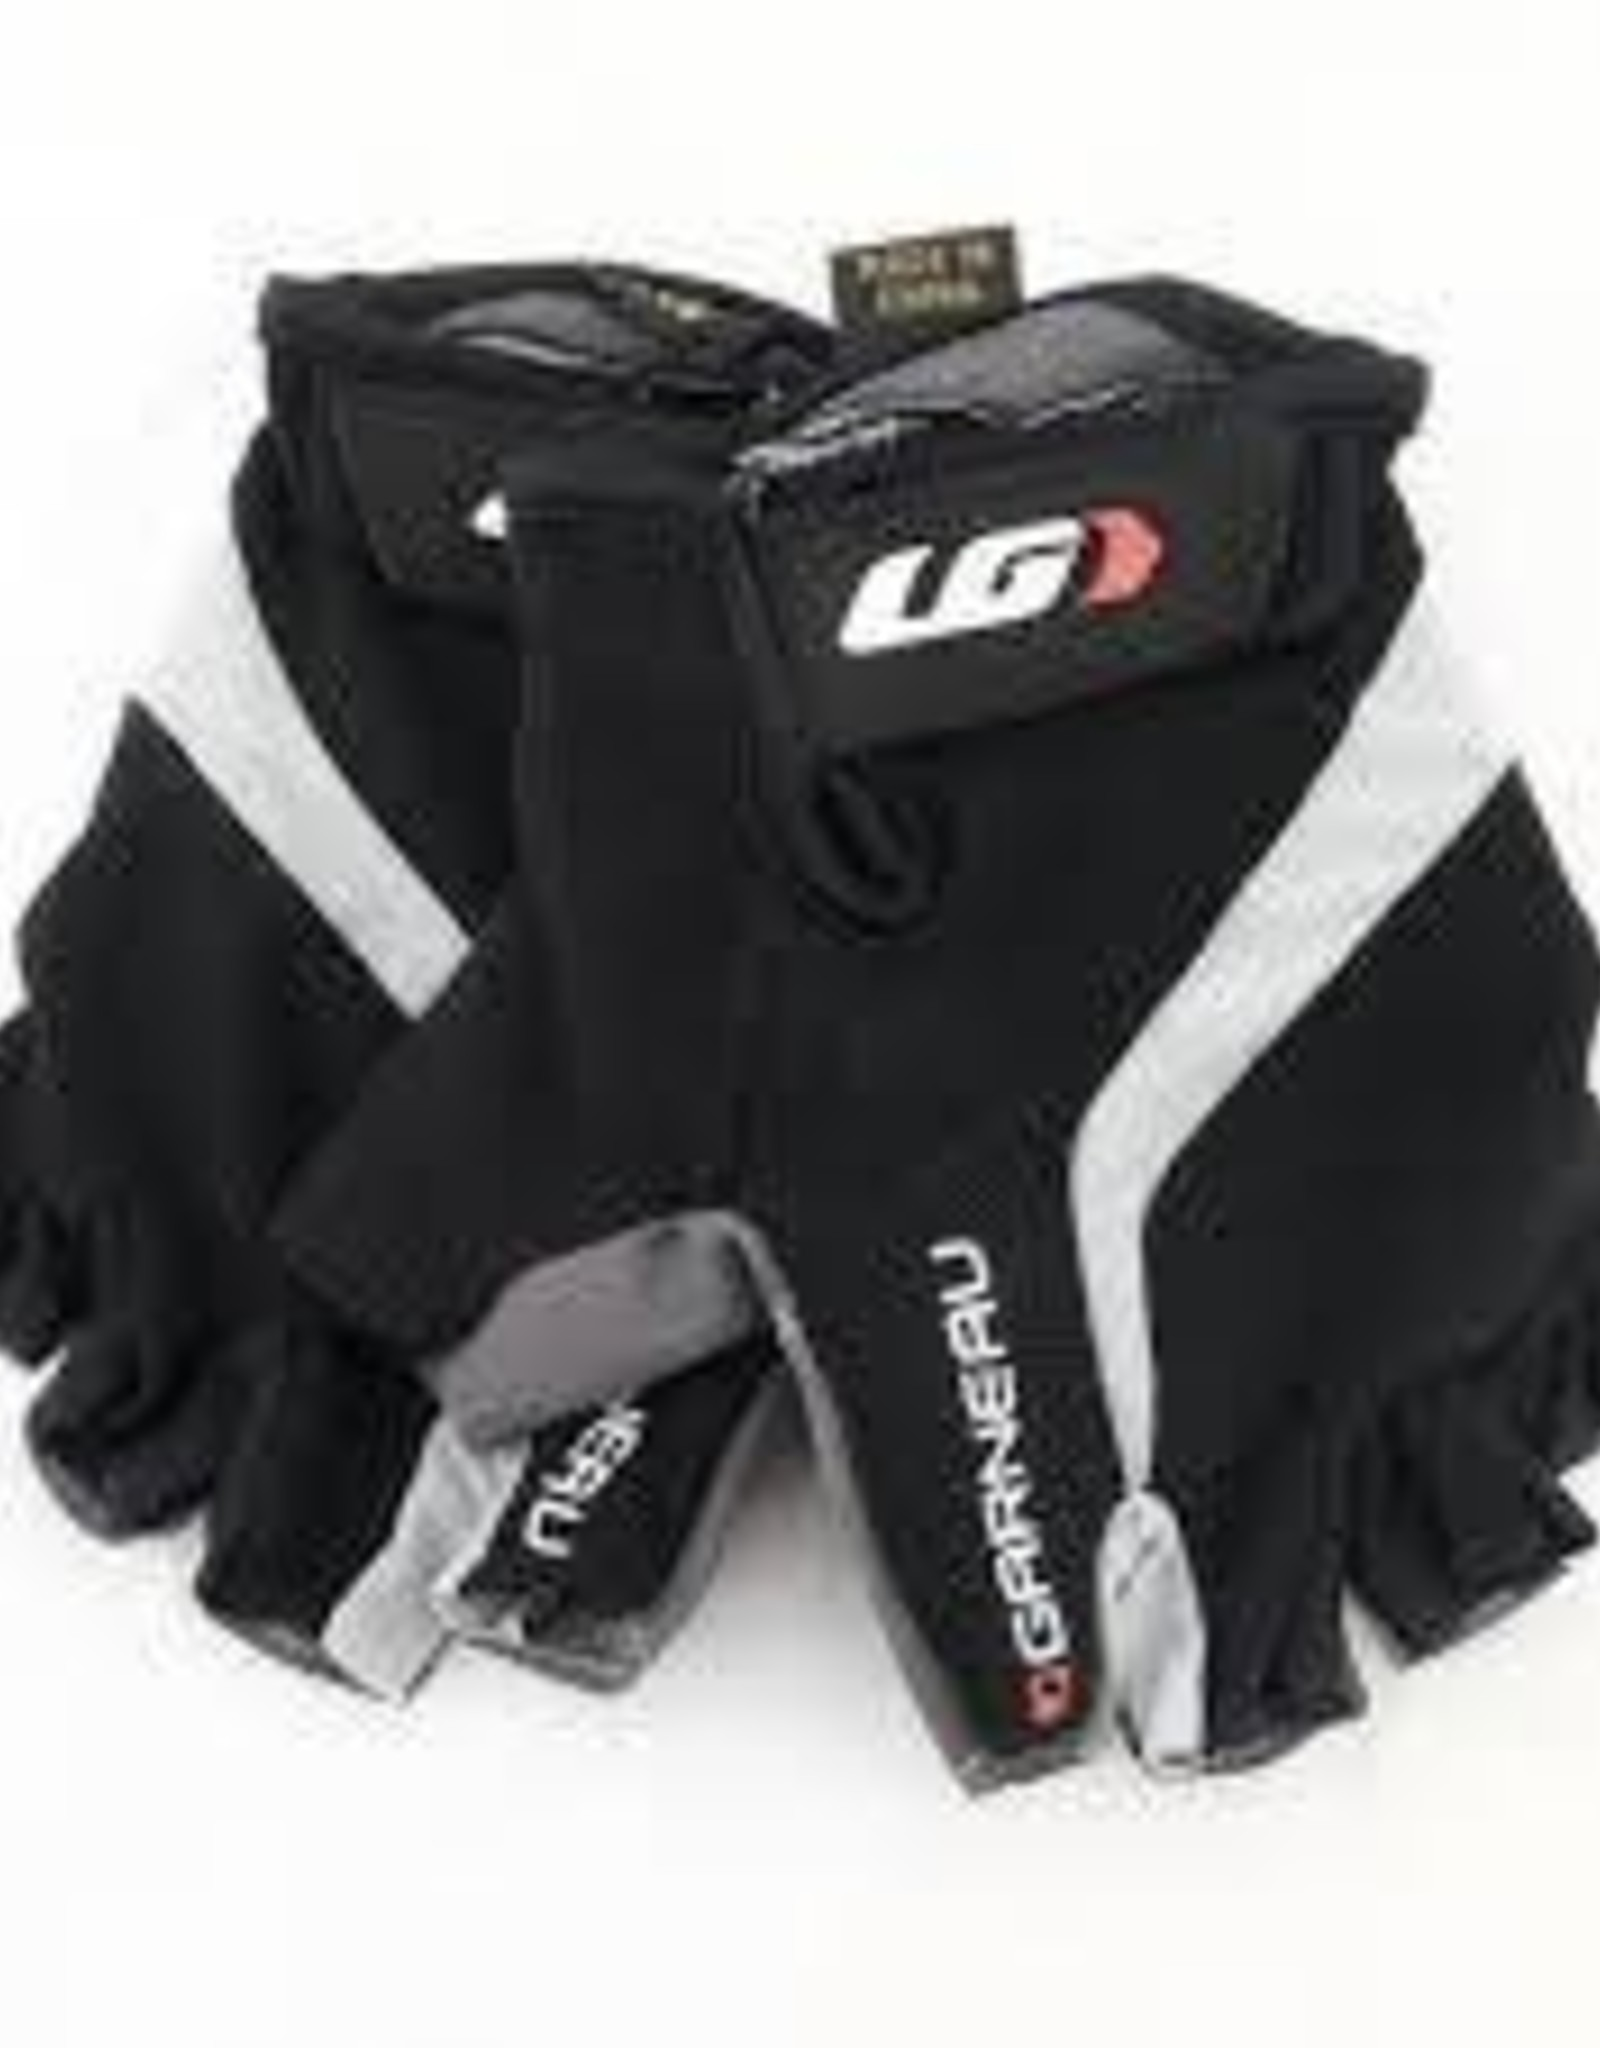 Louis Garneau Louis Garneau Biogel RX-V Glove: Black SM